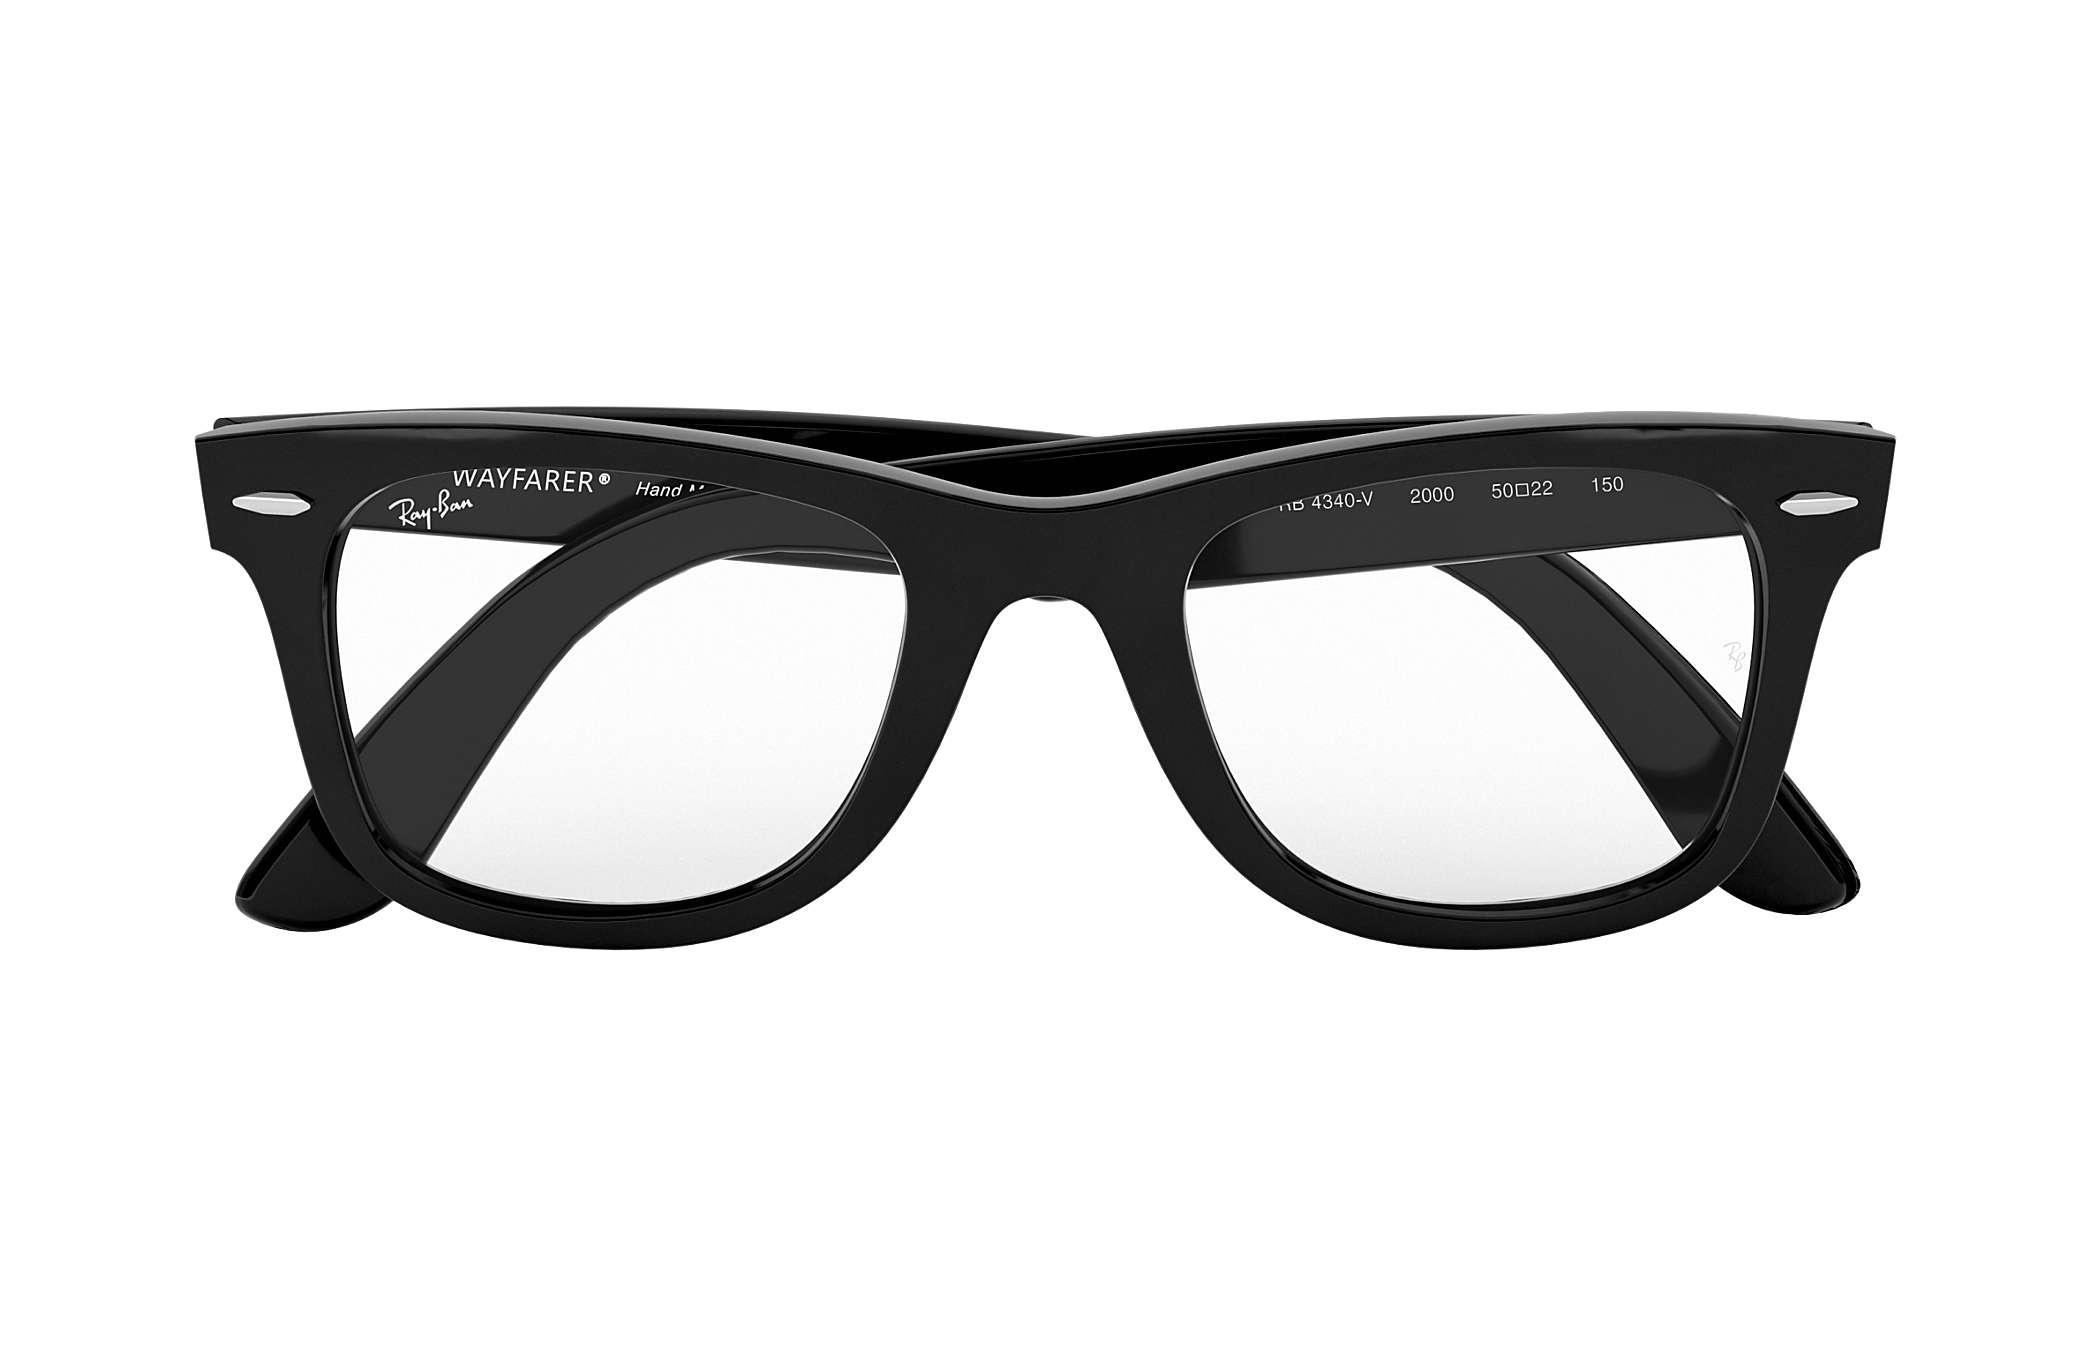 9d69d5938f0 Ray-Ban prescription glasses Wayfarer Ease Optics RB4340V Black ...